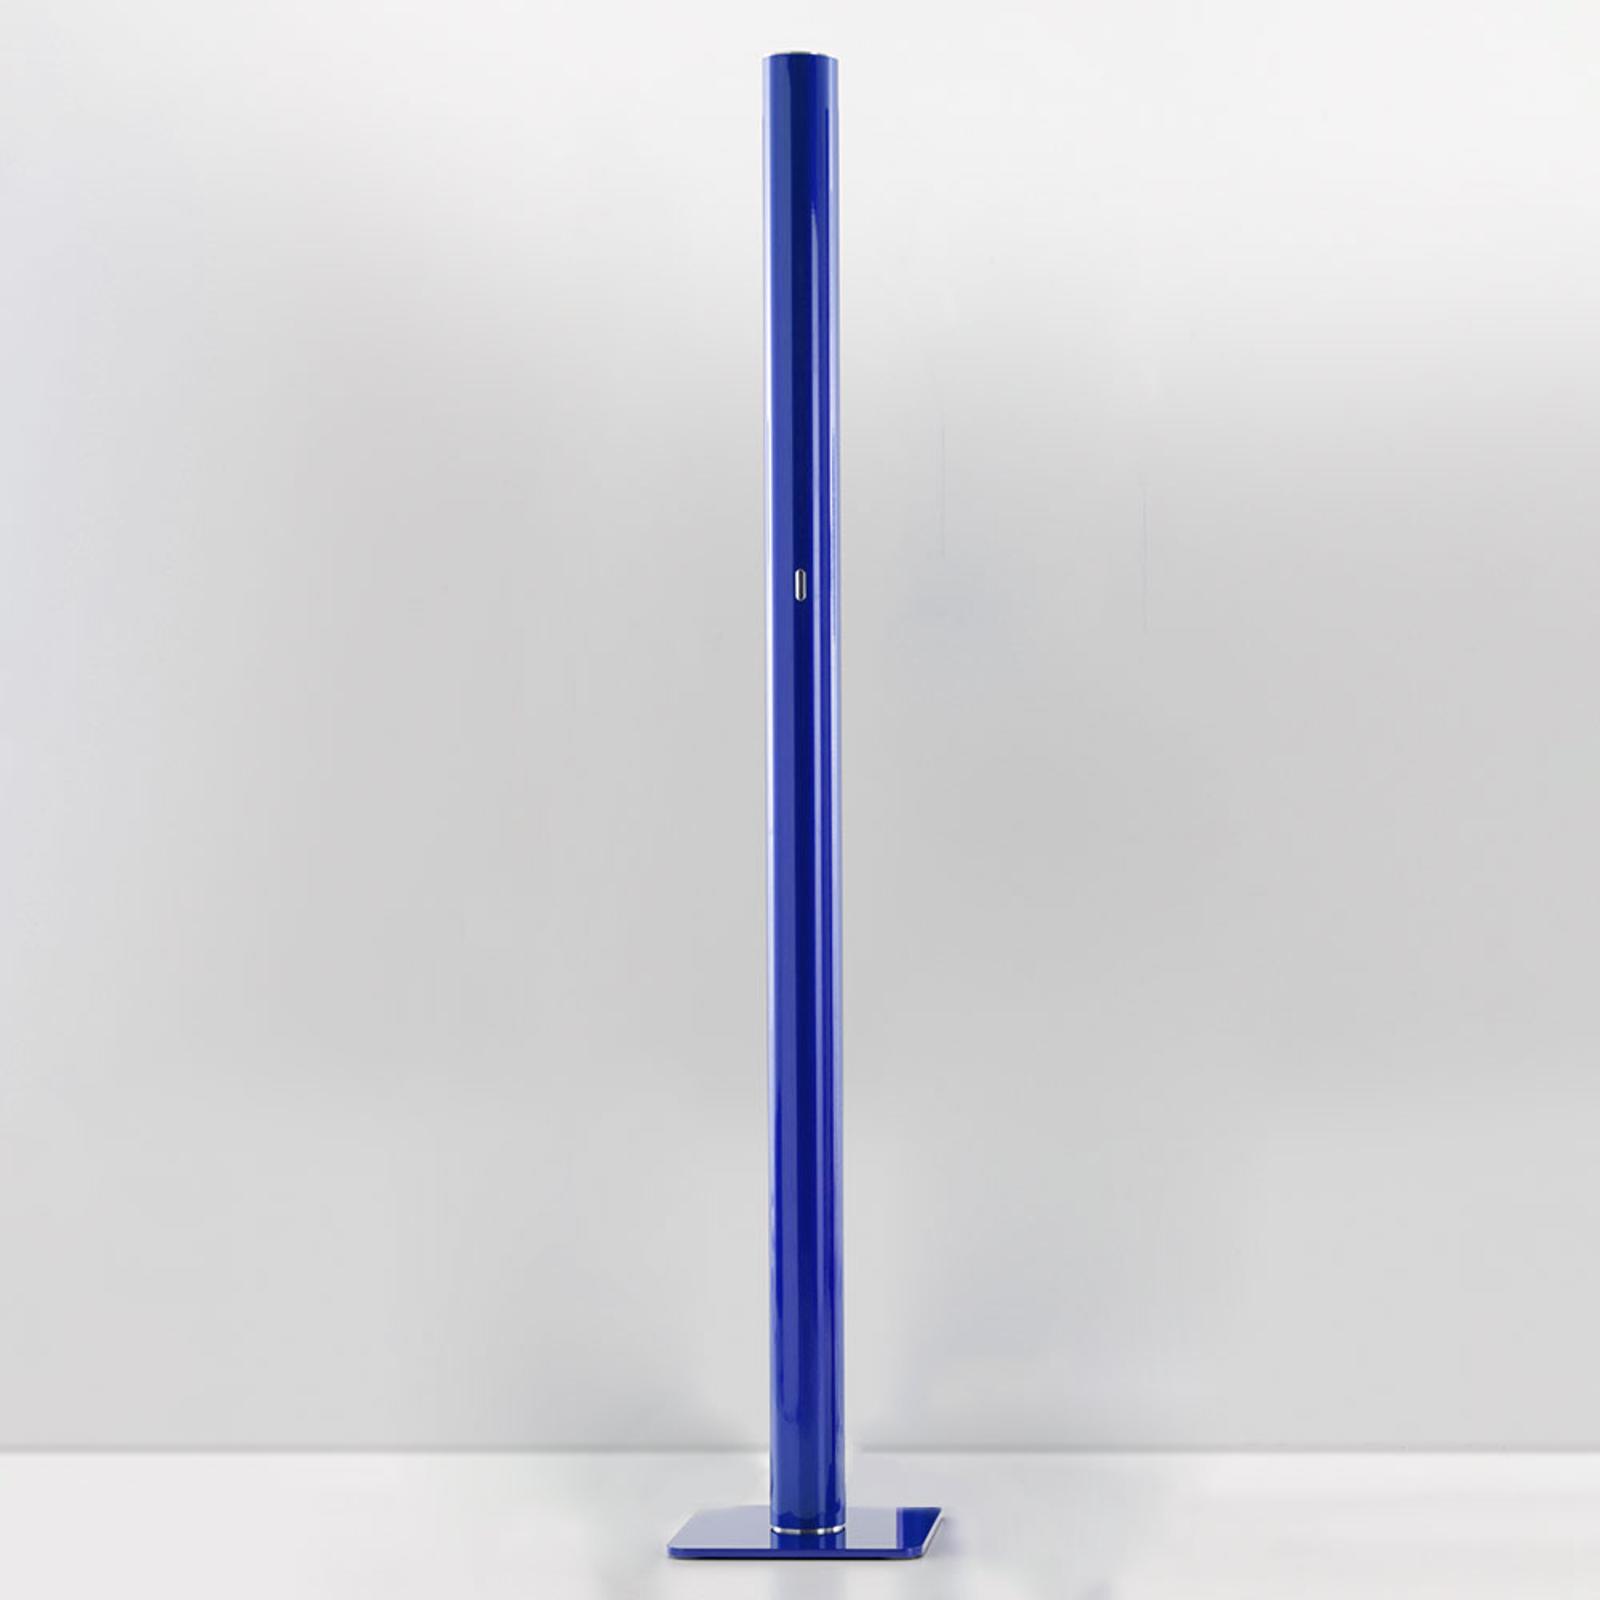 Artemide Ilio - LED-Stehleuchte, App, blau, 2700K